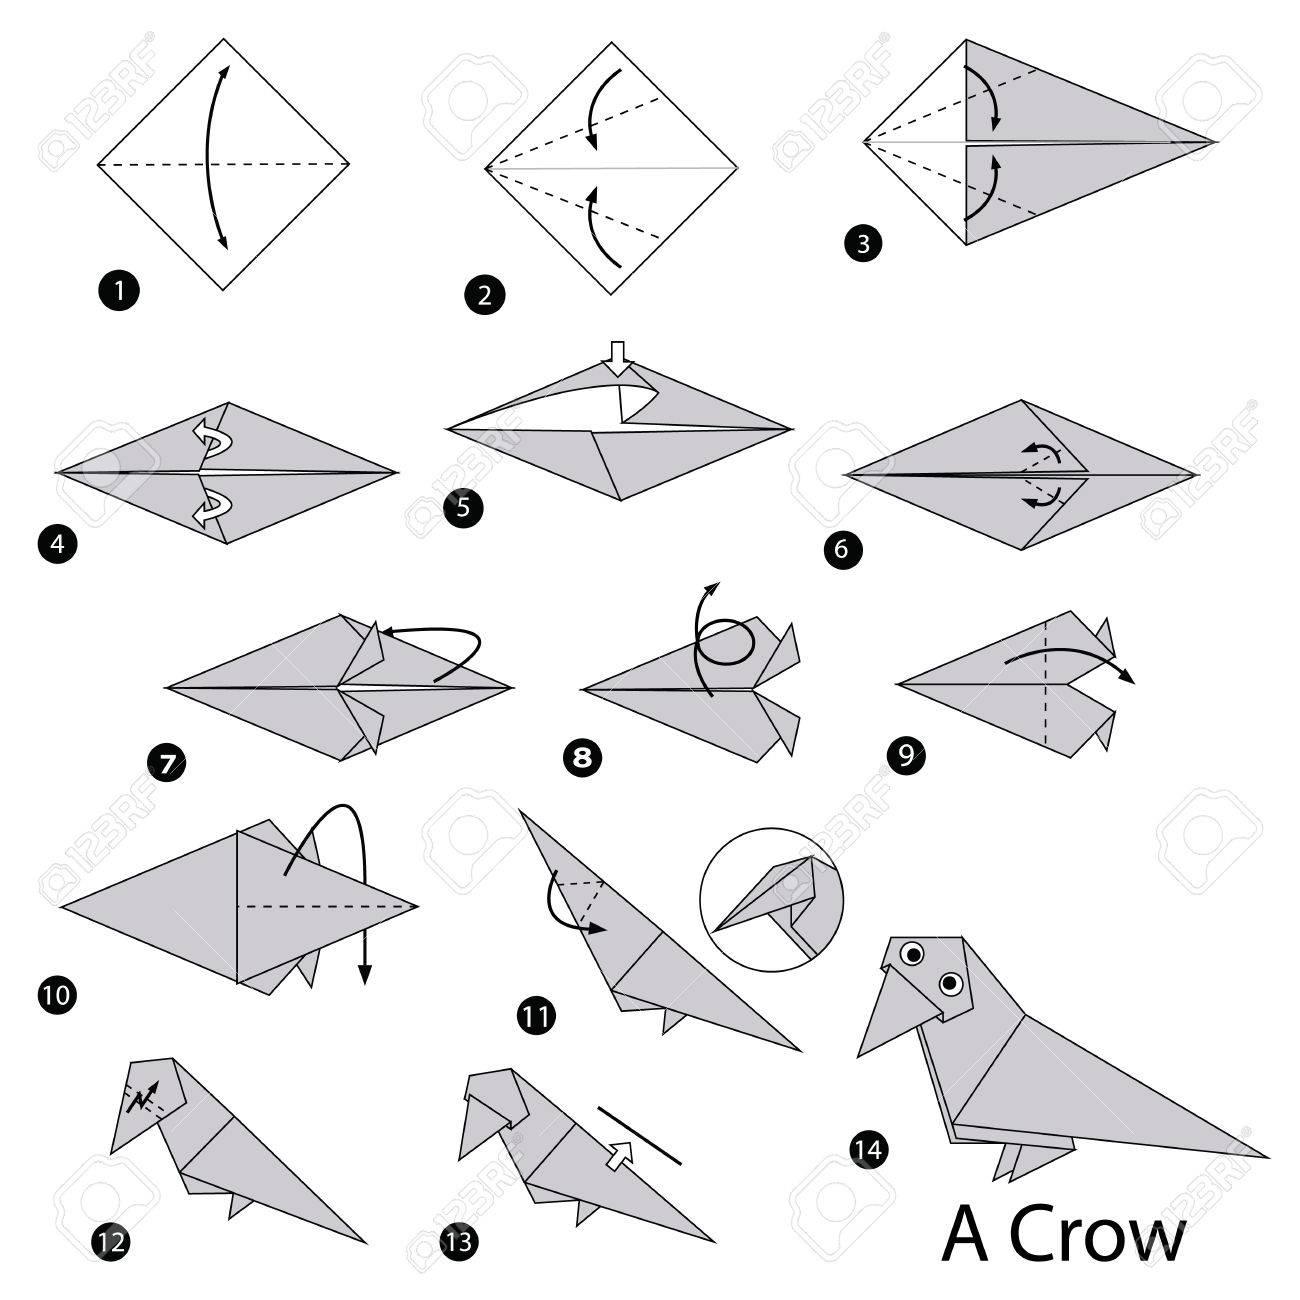 Contact us at Origami-Instructions.com   1300x1300